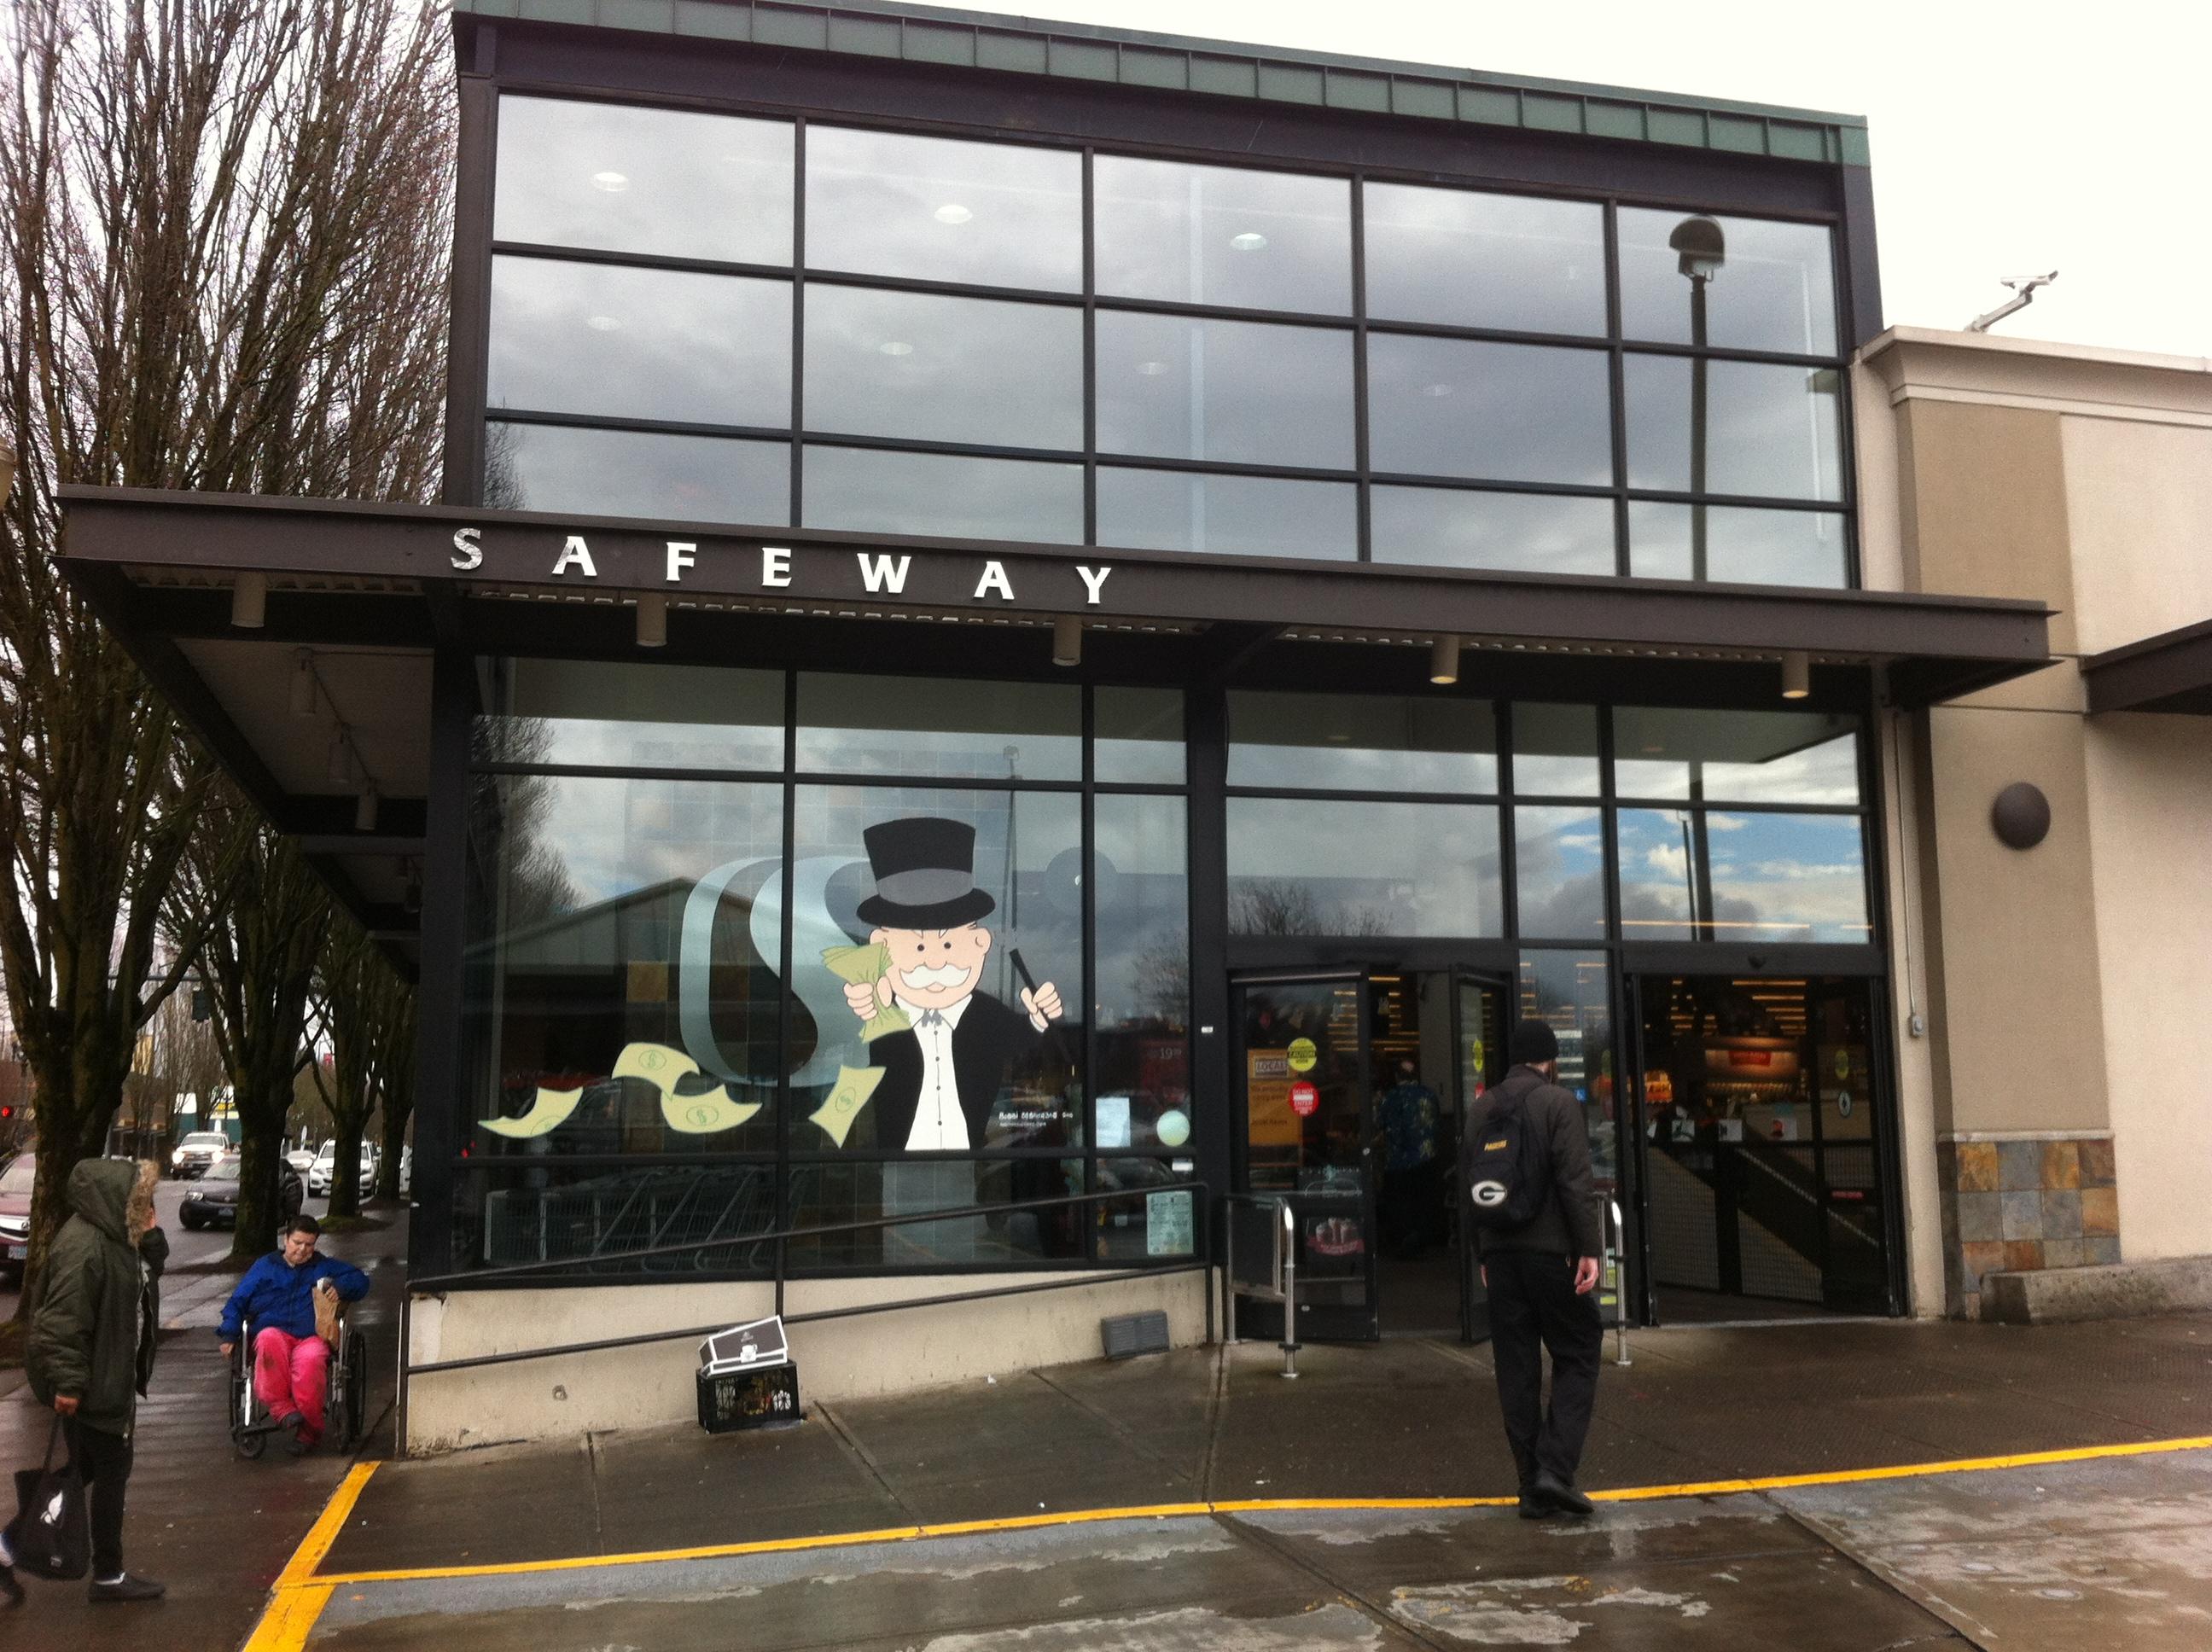 Safeway Monopoly Promo Window